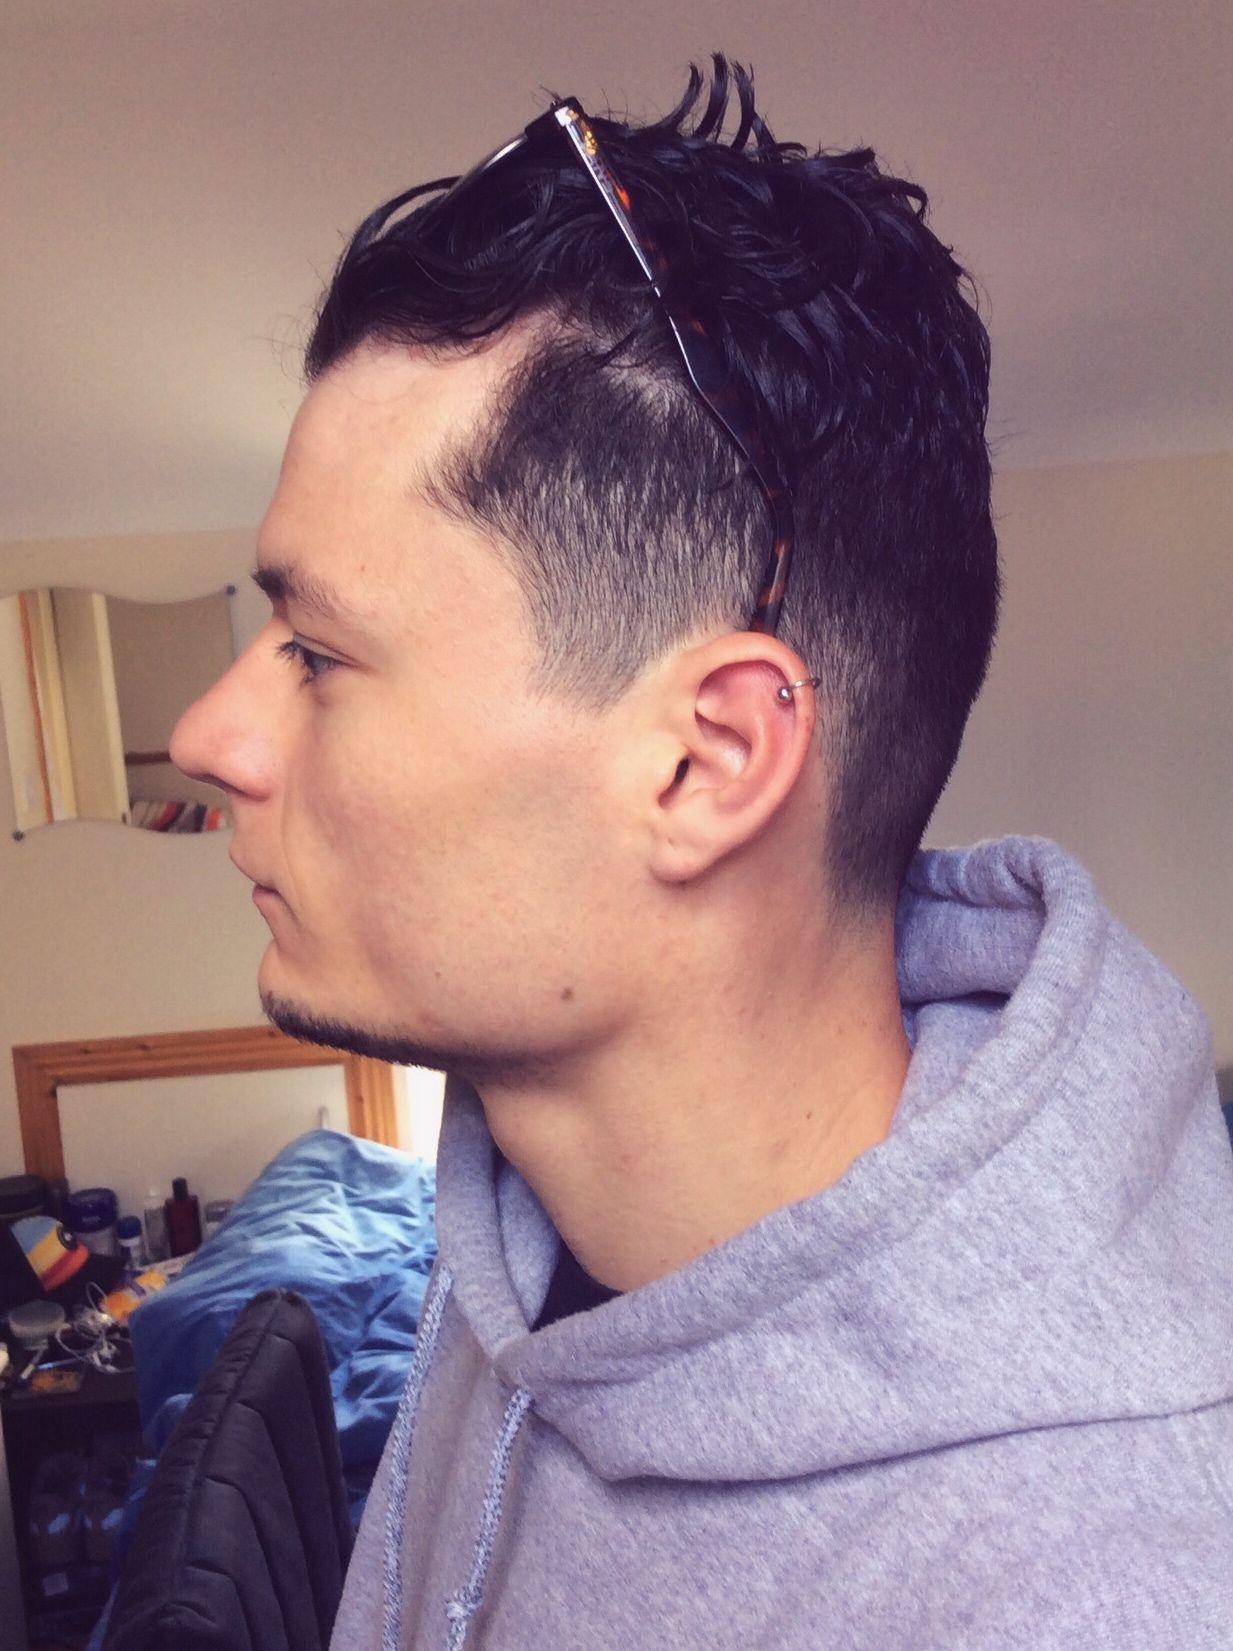 Helix Piercing Haircut Undercut Glasses Men Fade Curly